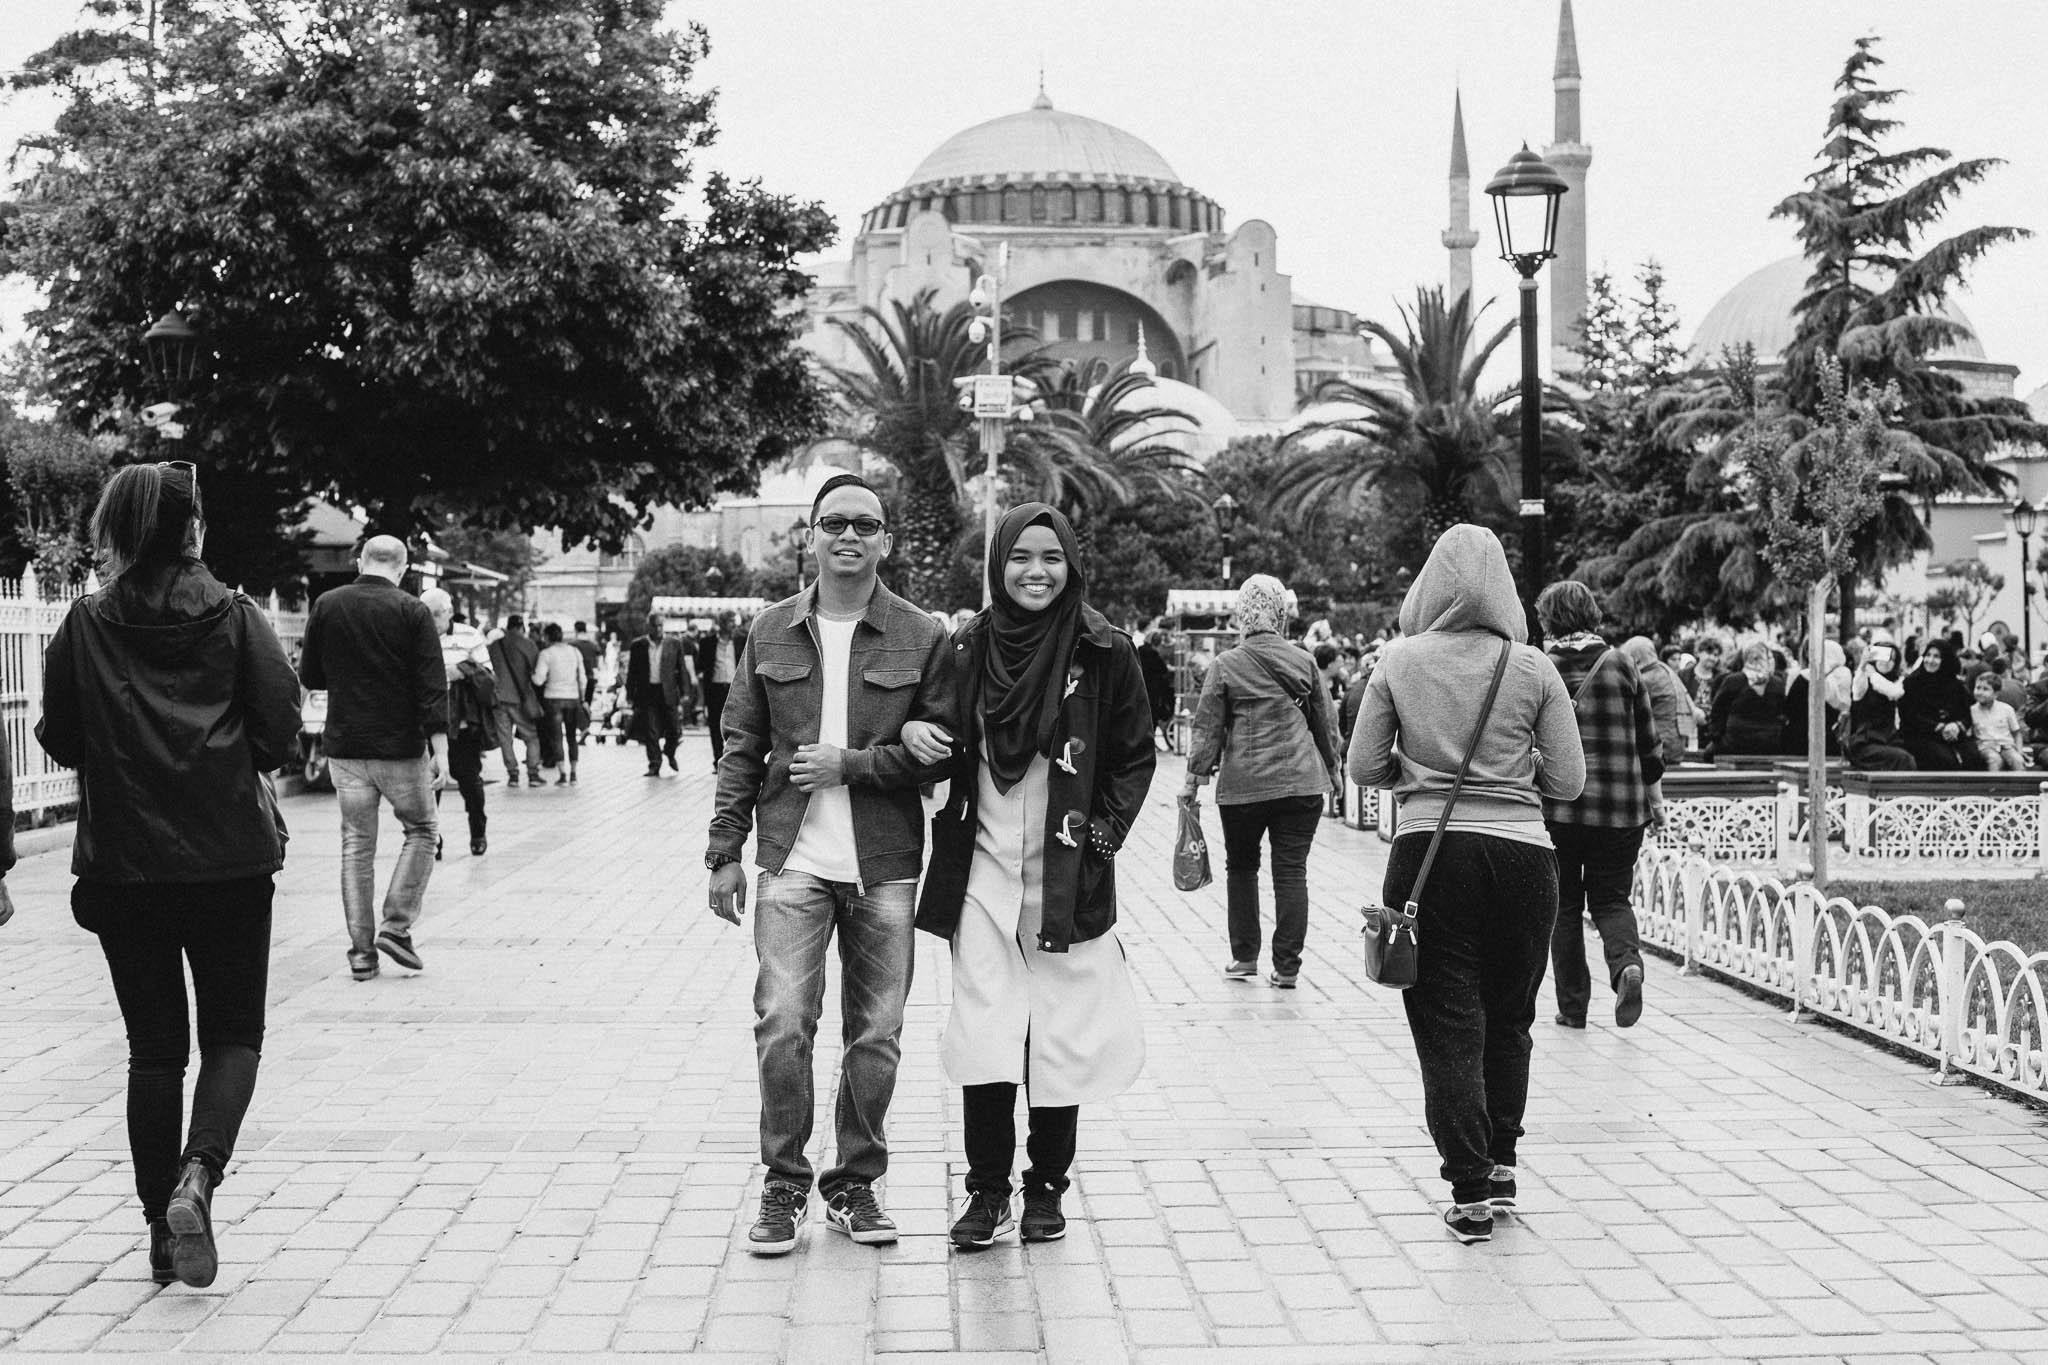 singapore-wedding-photographer-dzul-isma-istanbul-wmt-17.jpg